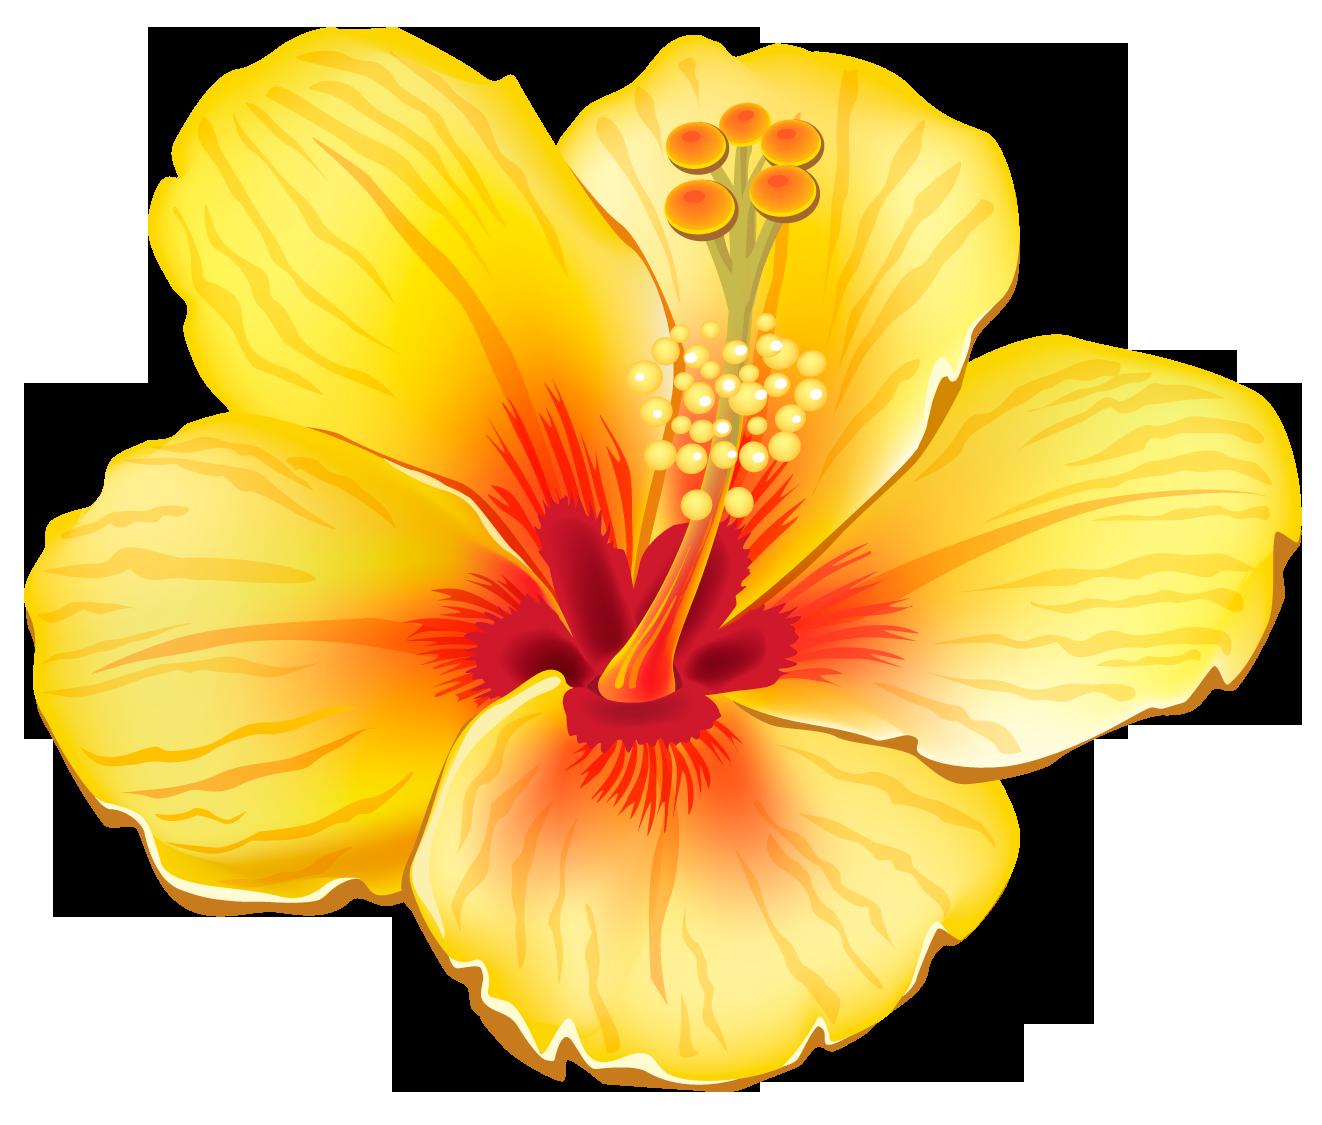 Pin By Monique Fox On Clip Art Tropical Flower Tattoos Hawaiian Art Tropical Flowers